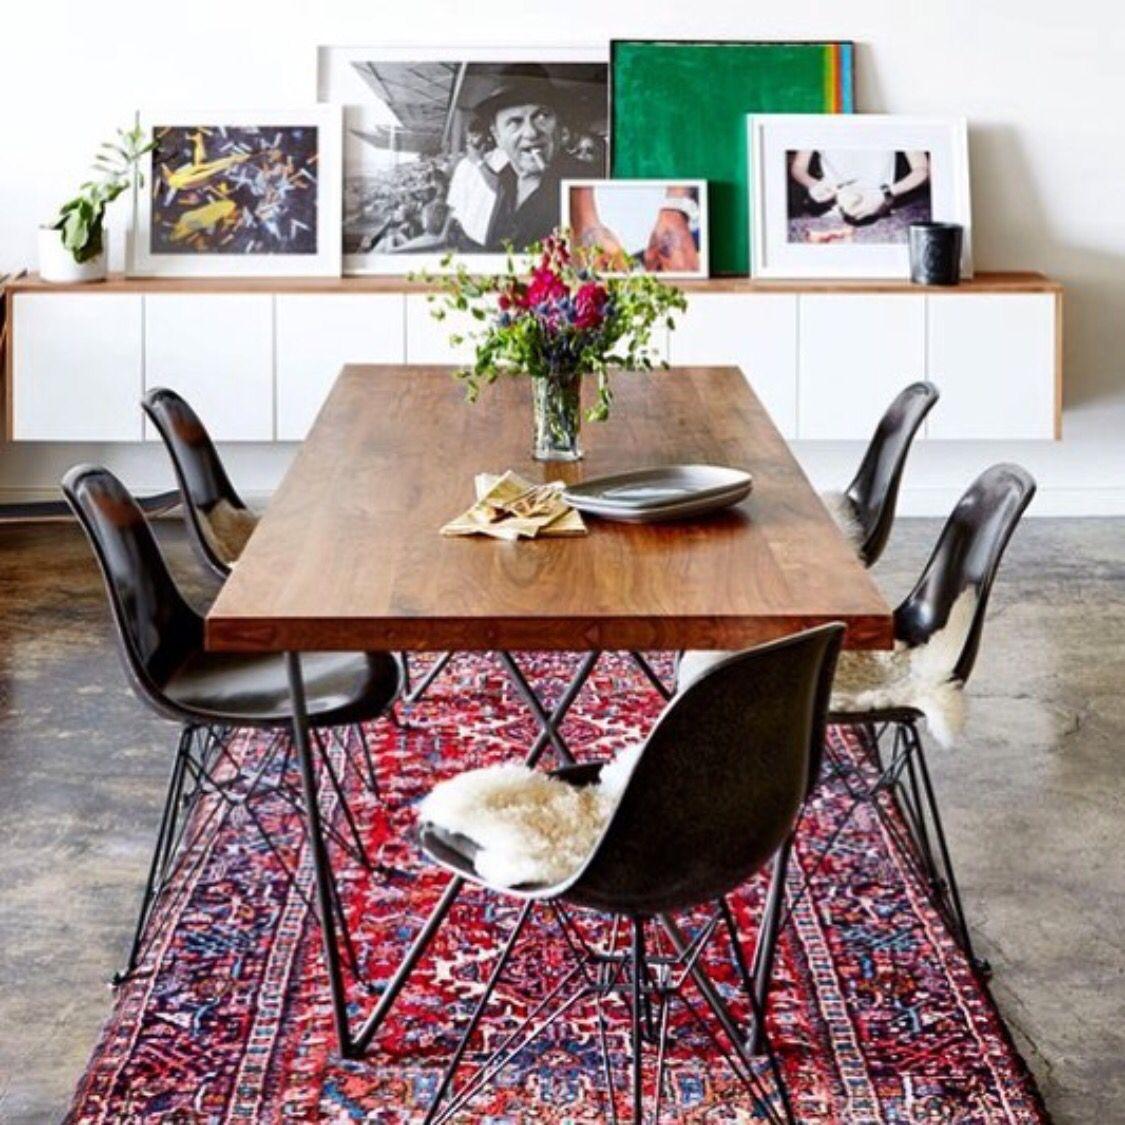 Display arte comedor sillas negro moderno